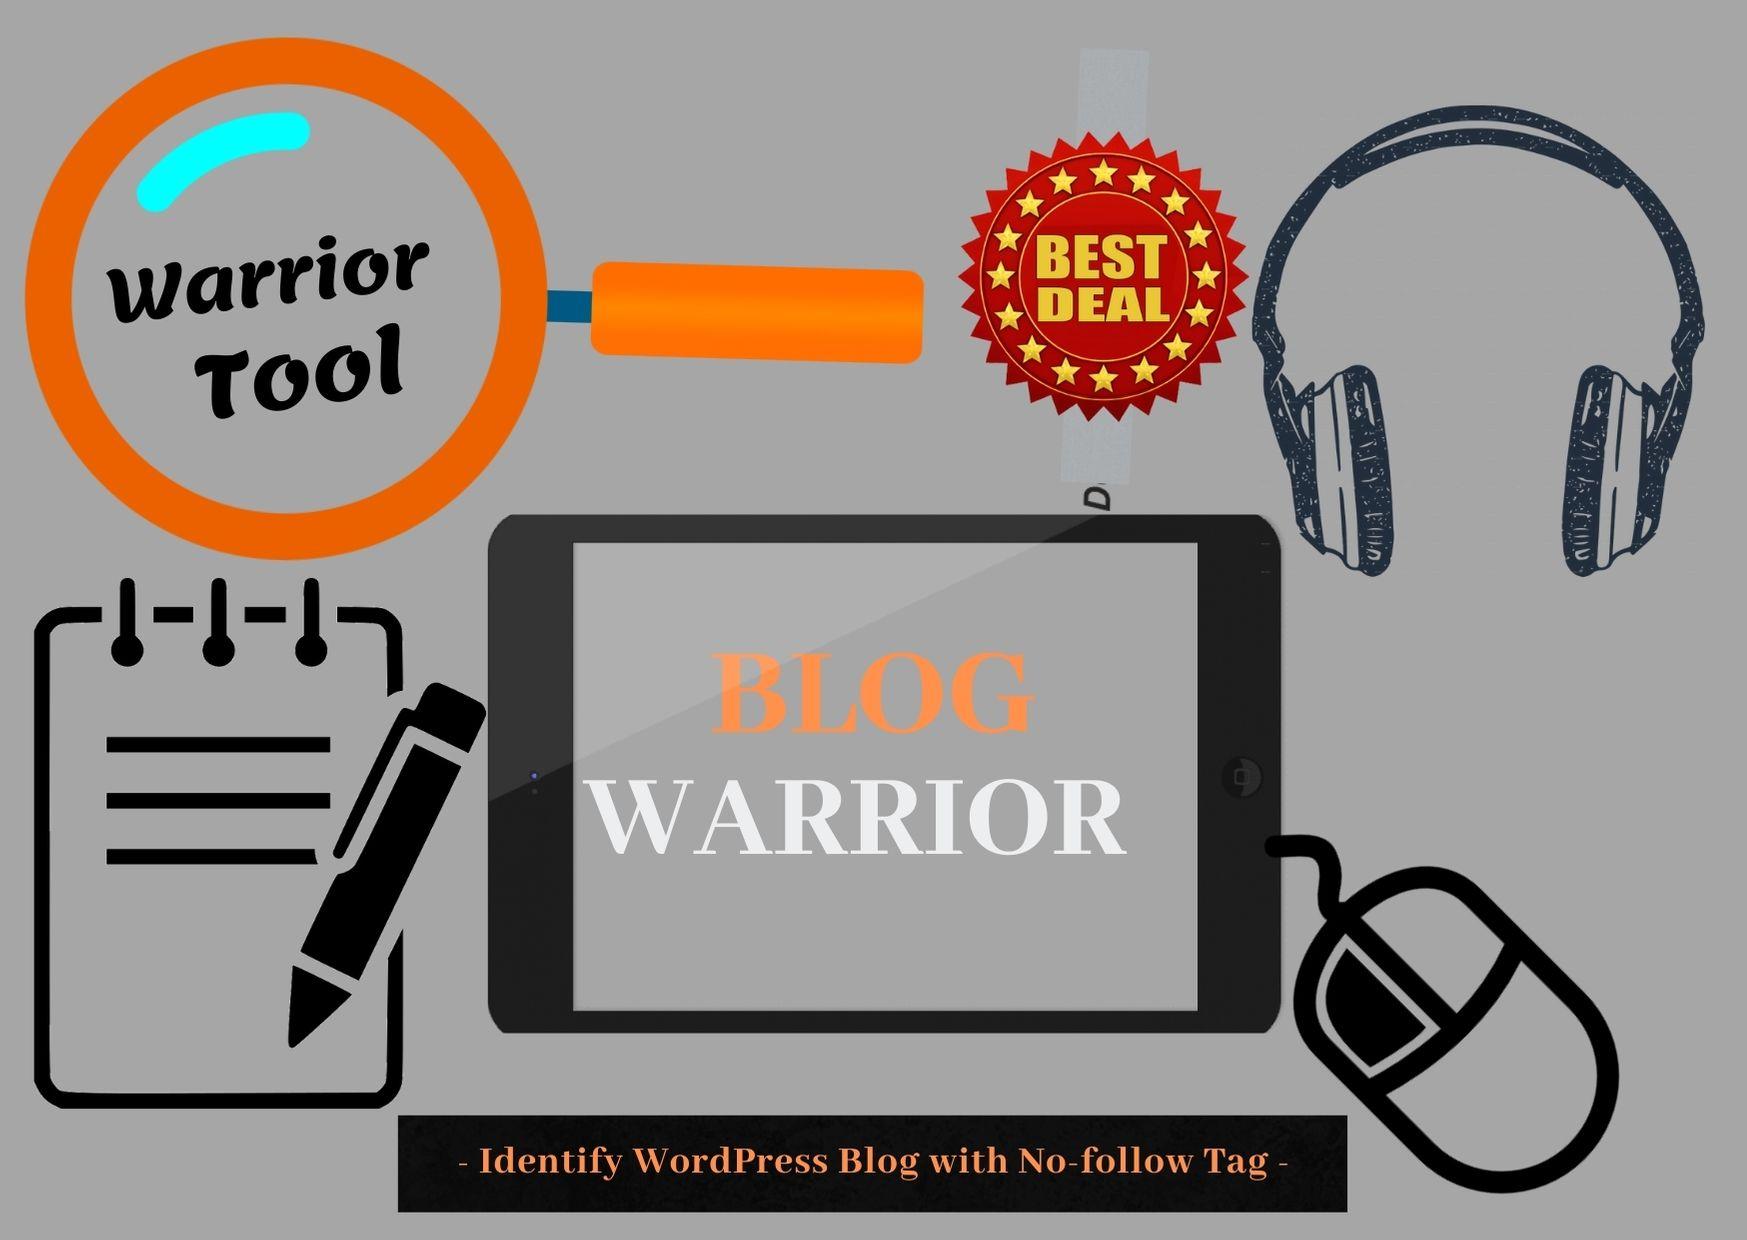 Blog Warrior - Identify WordPress Blog with No Follow Tags